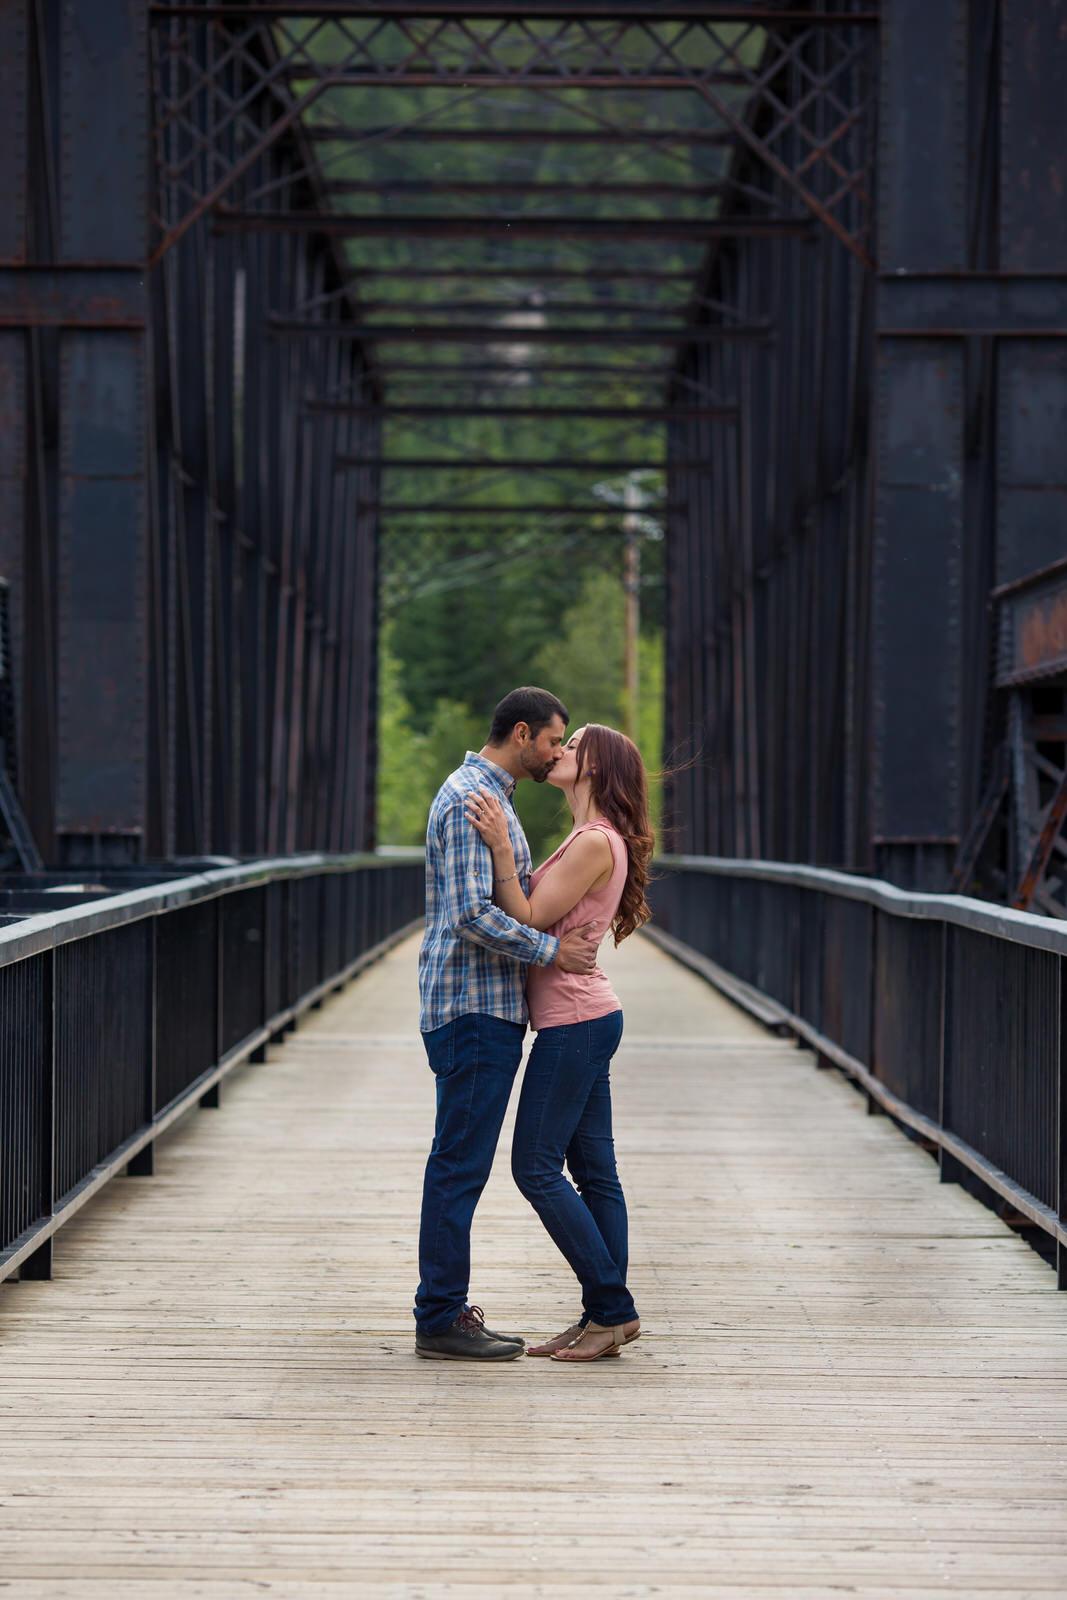 Matt and Aslhey Engagement Photos Canmore 83.jpg